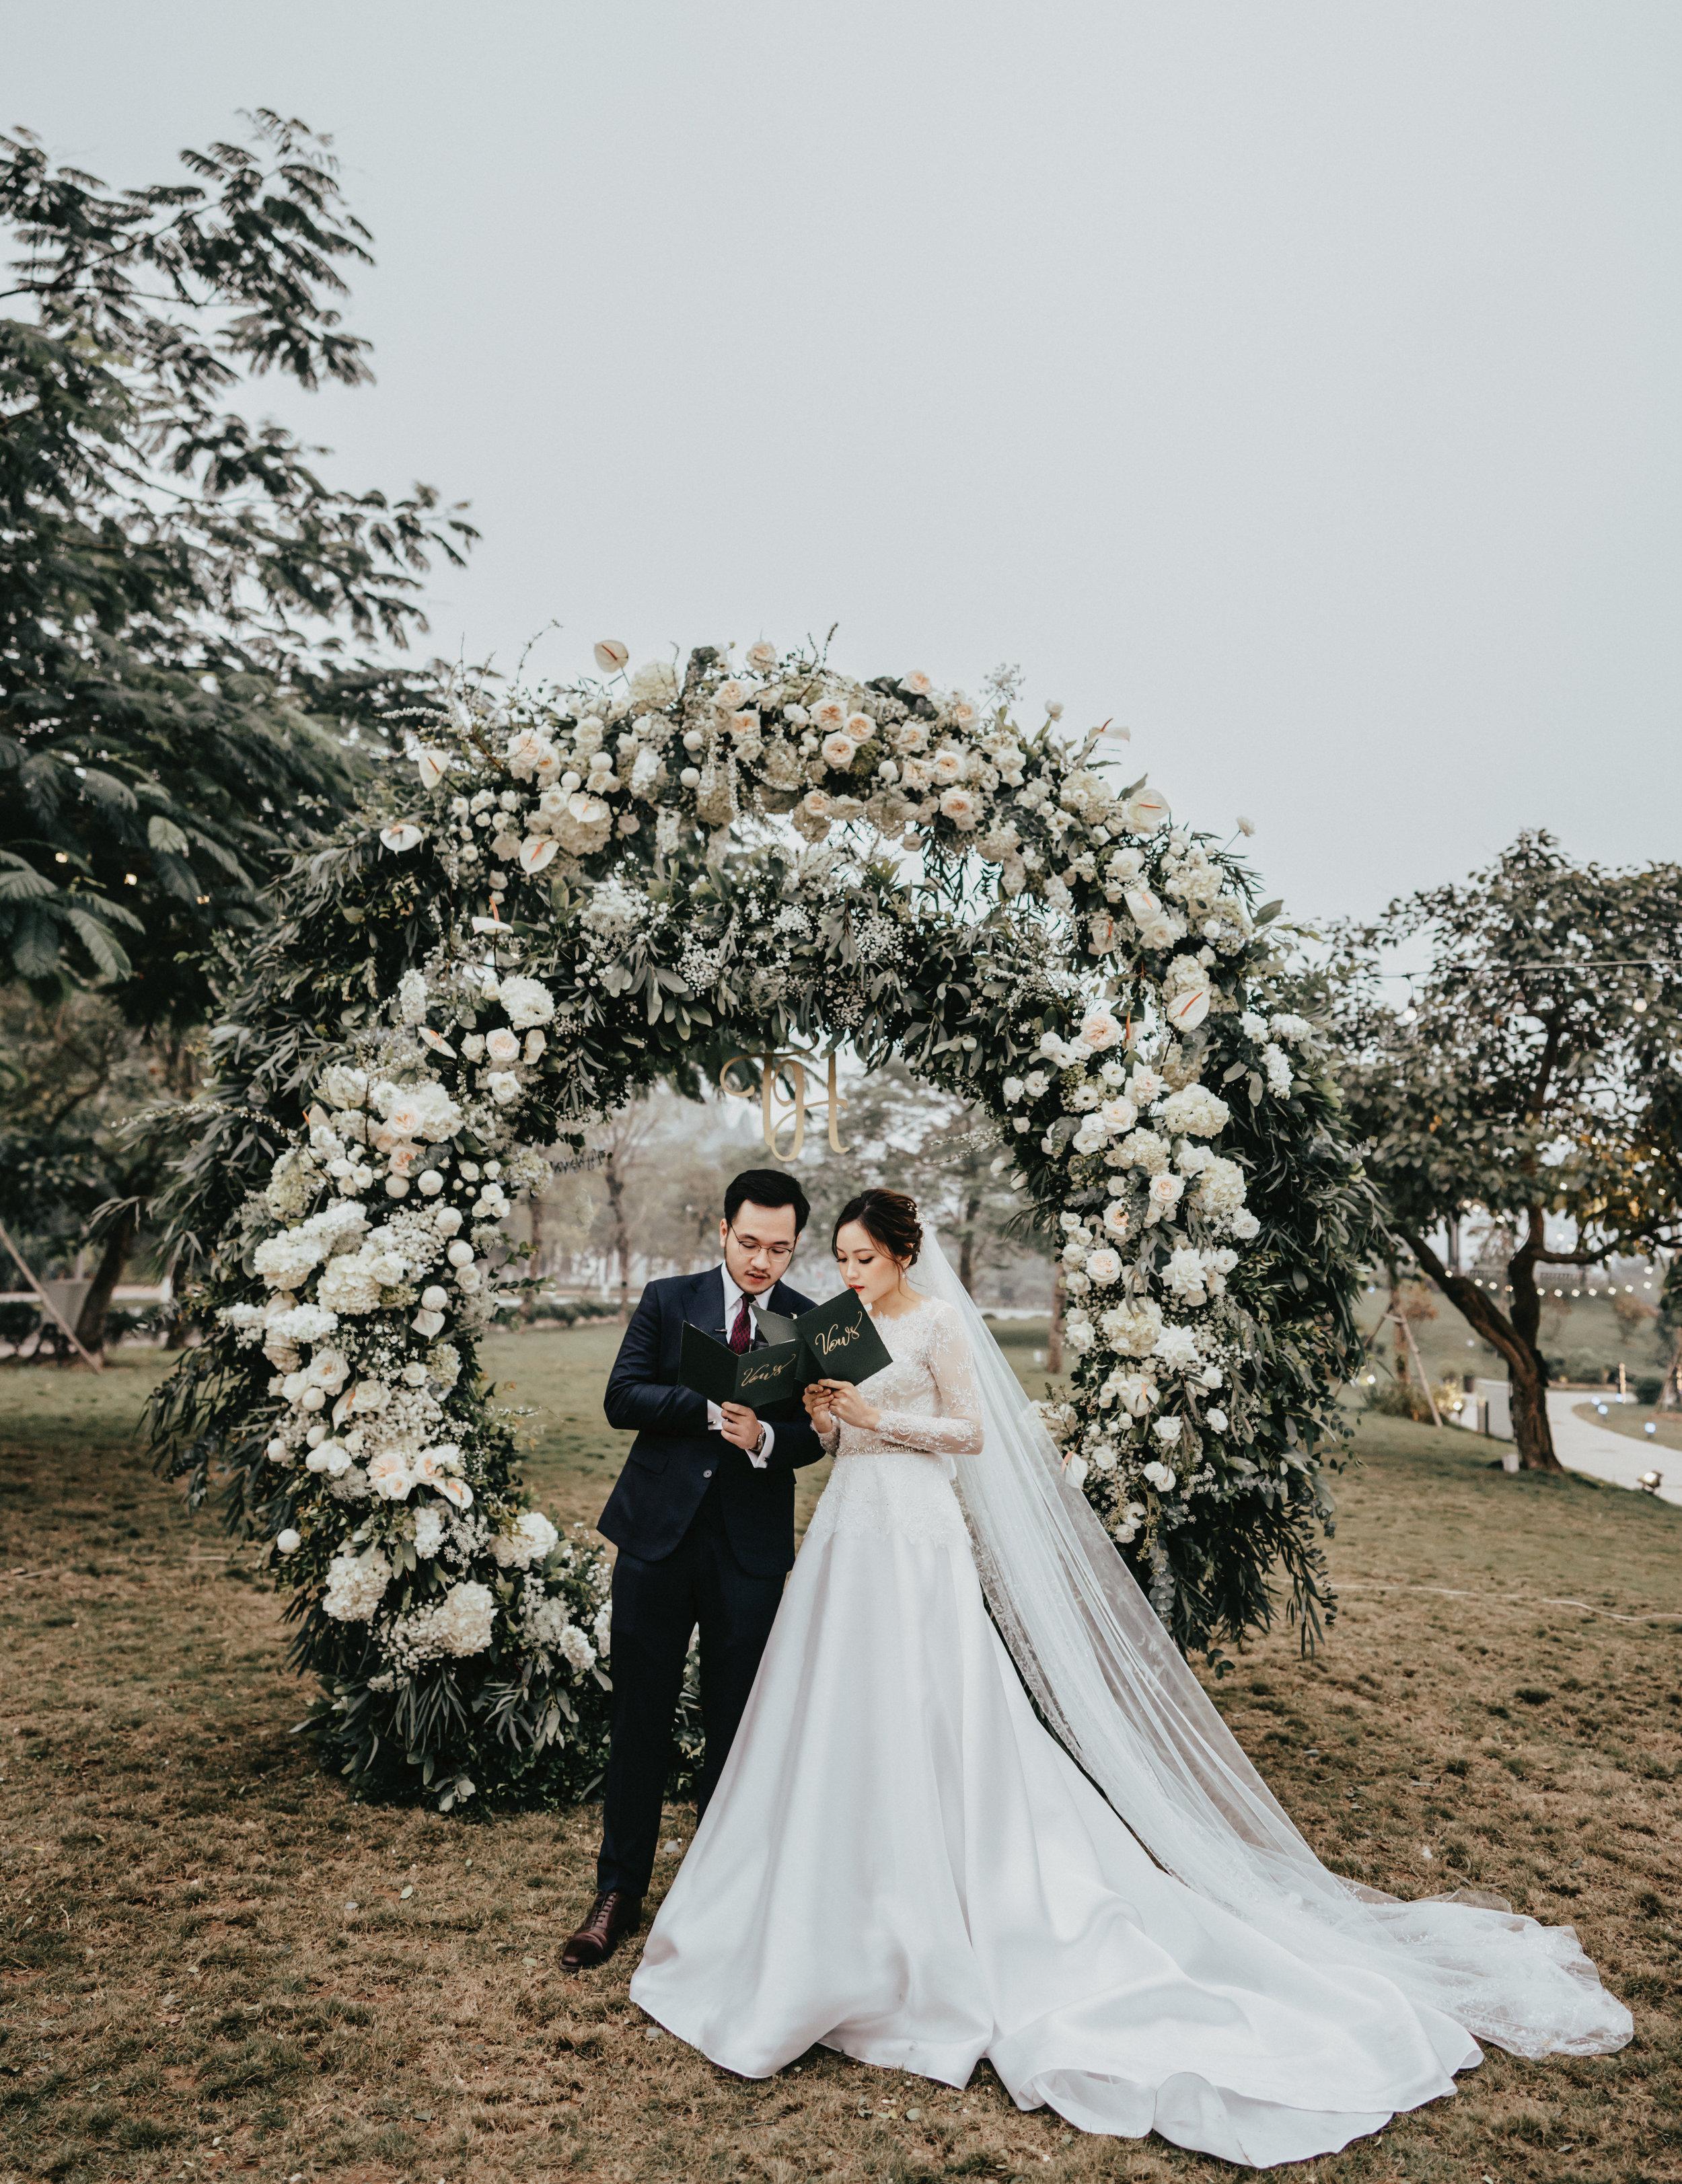 JWMarriott Ha Noi Intimate Wedding of Trang Hi well captured by Hipster Wedding Vietnam Wedding Photographer-35880.jpg